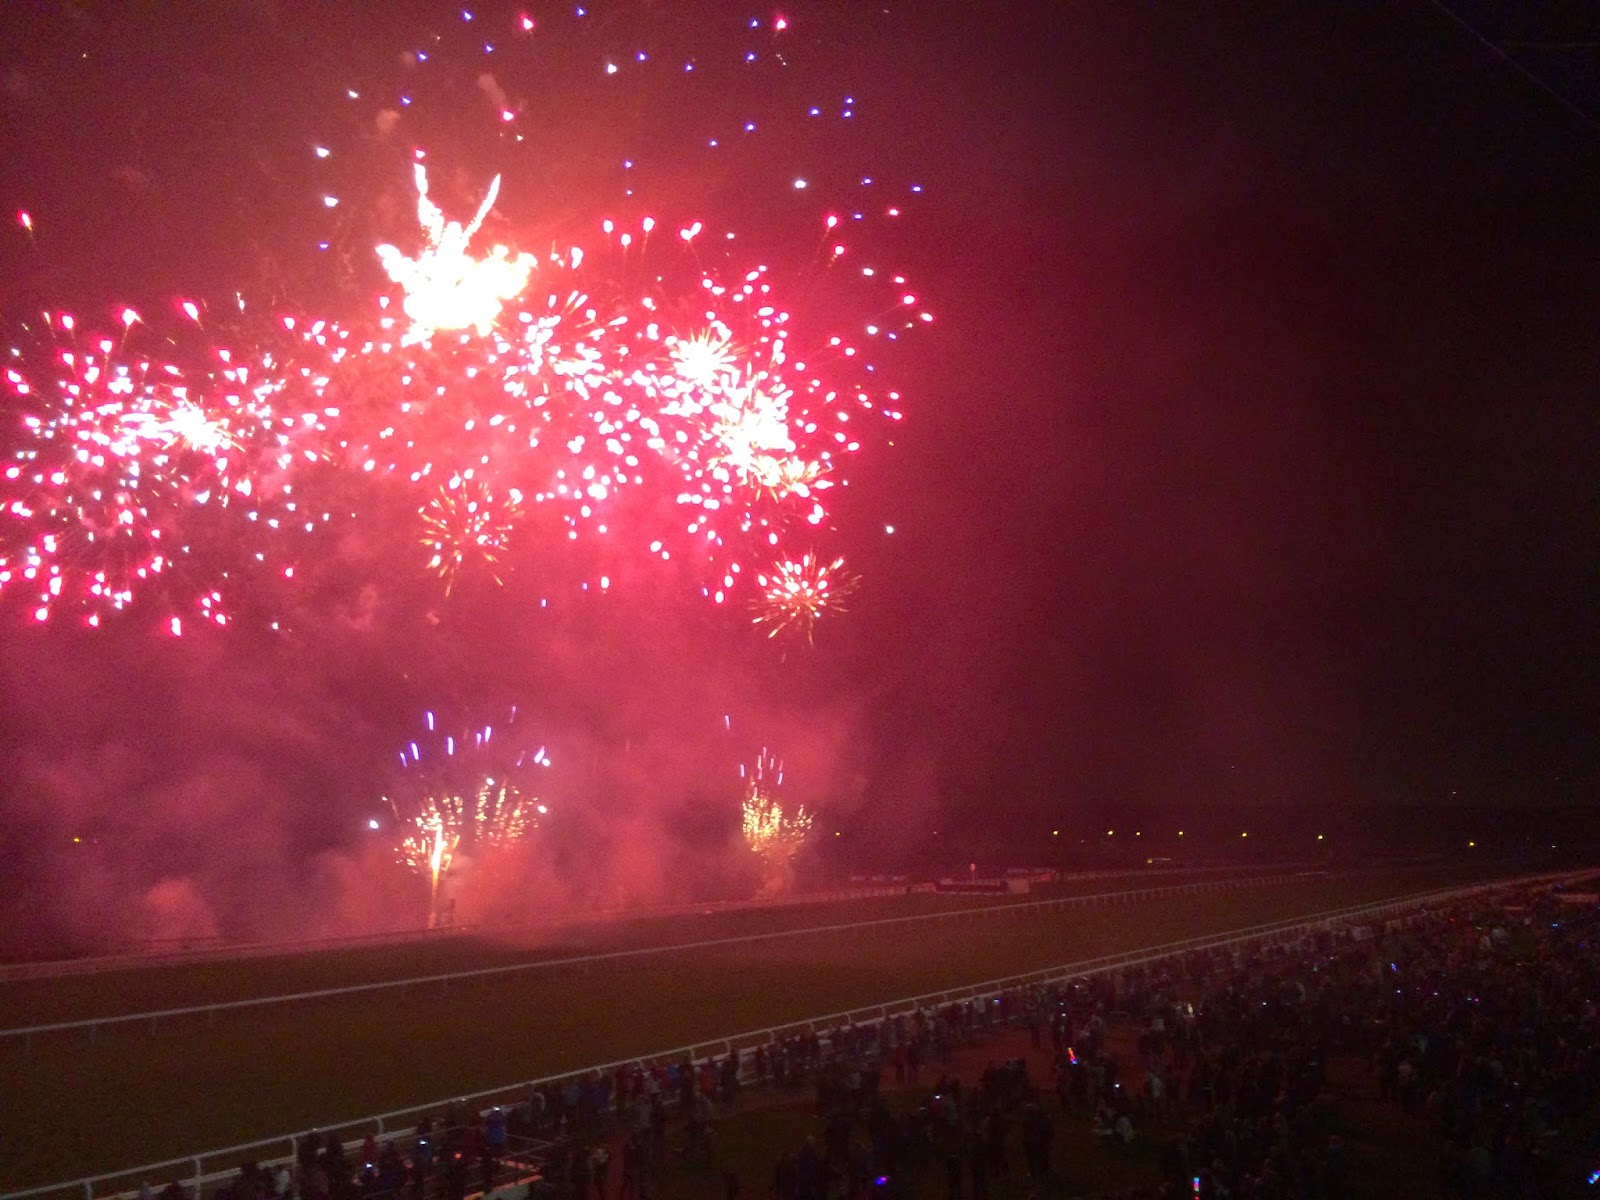 Ascot racecourse fireworks - 1st November 2014